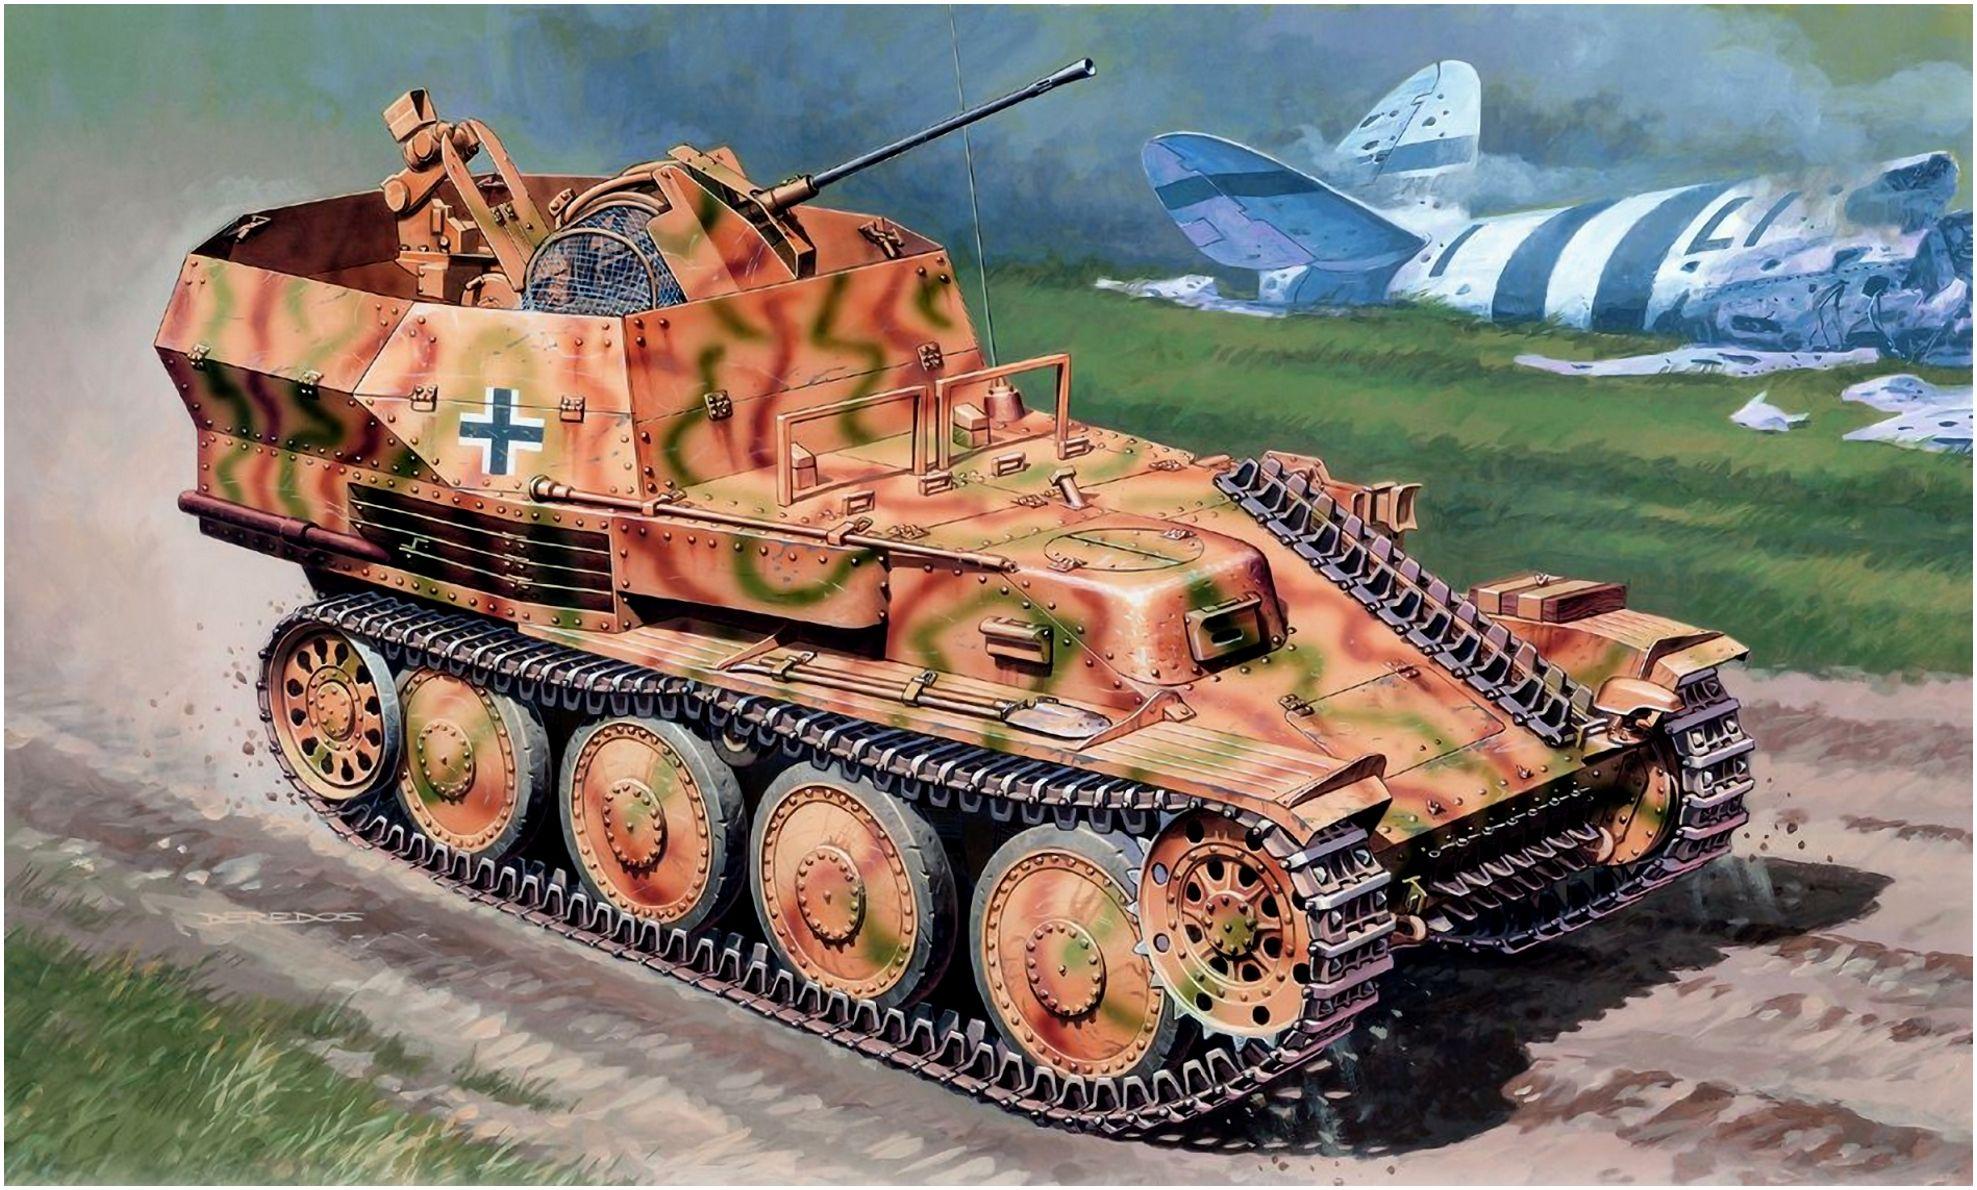 Deredos Andrzej. ЗСУ Flakpanzer 38(t) Ausf. L.